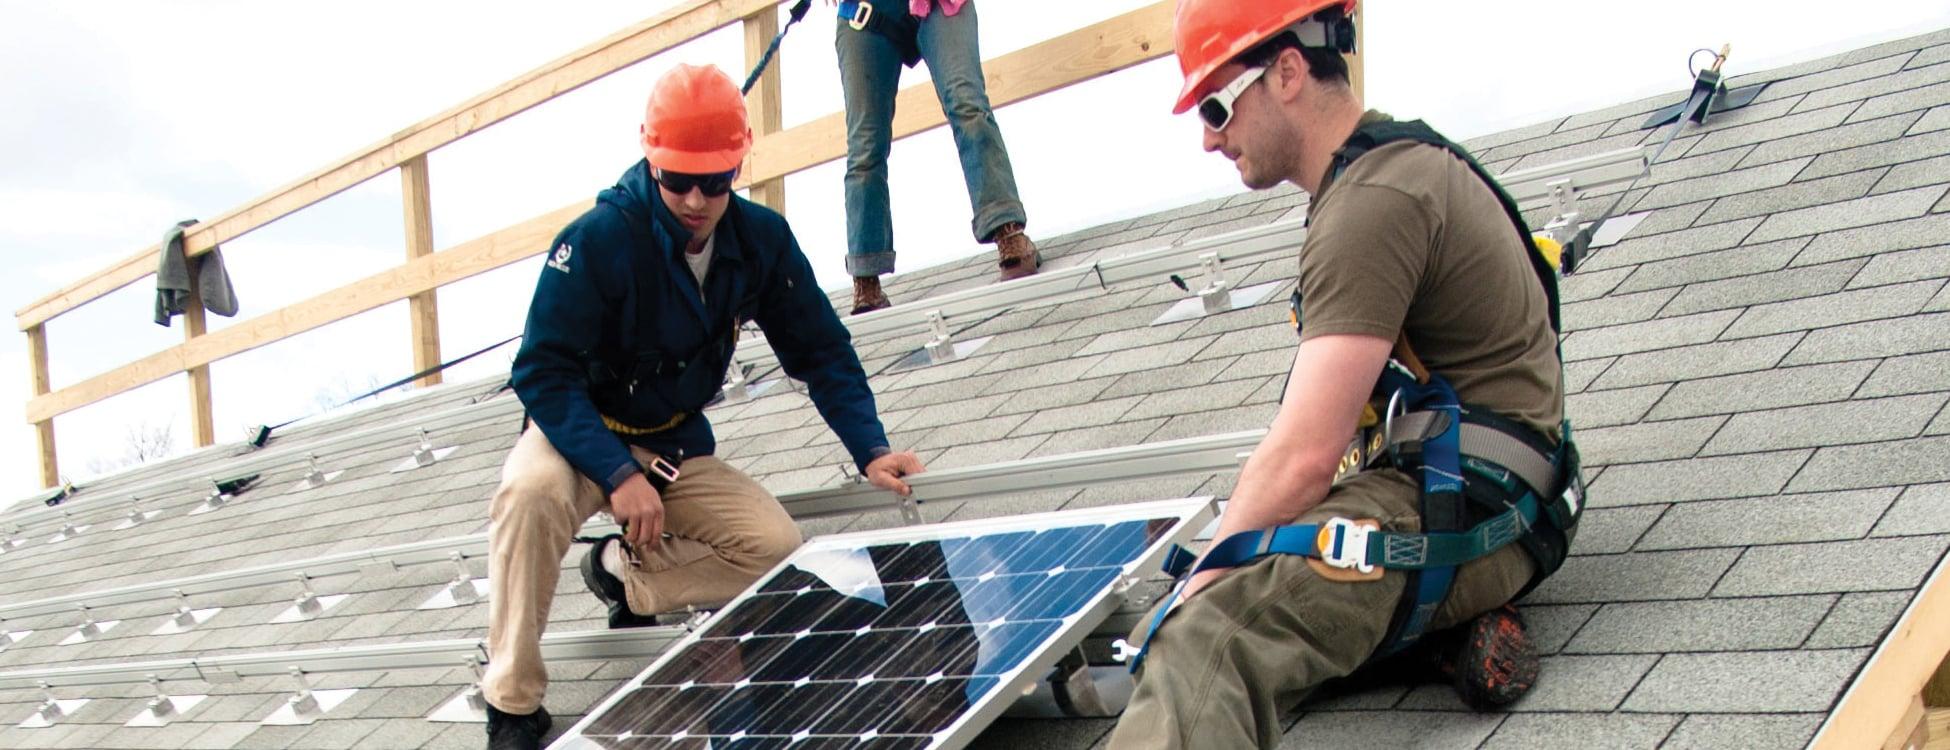 students installing solar panels, laboratory, hands on, renewable energy